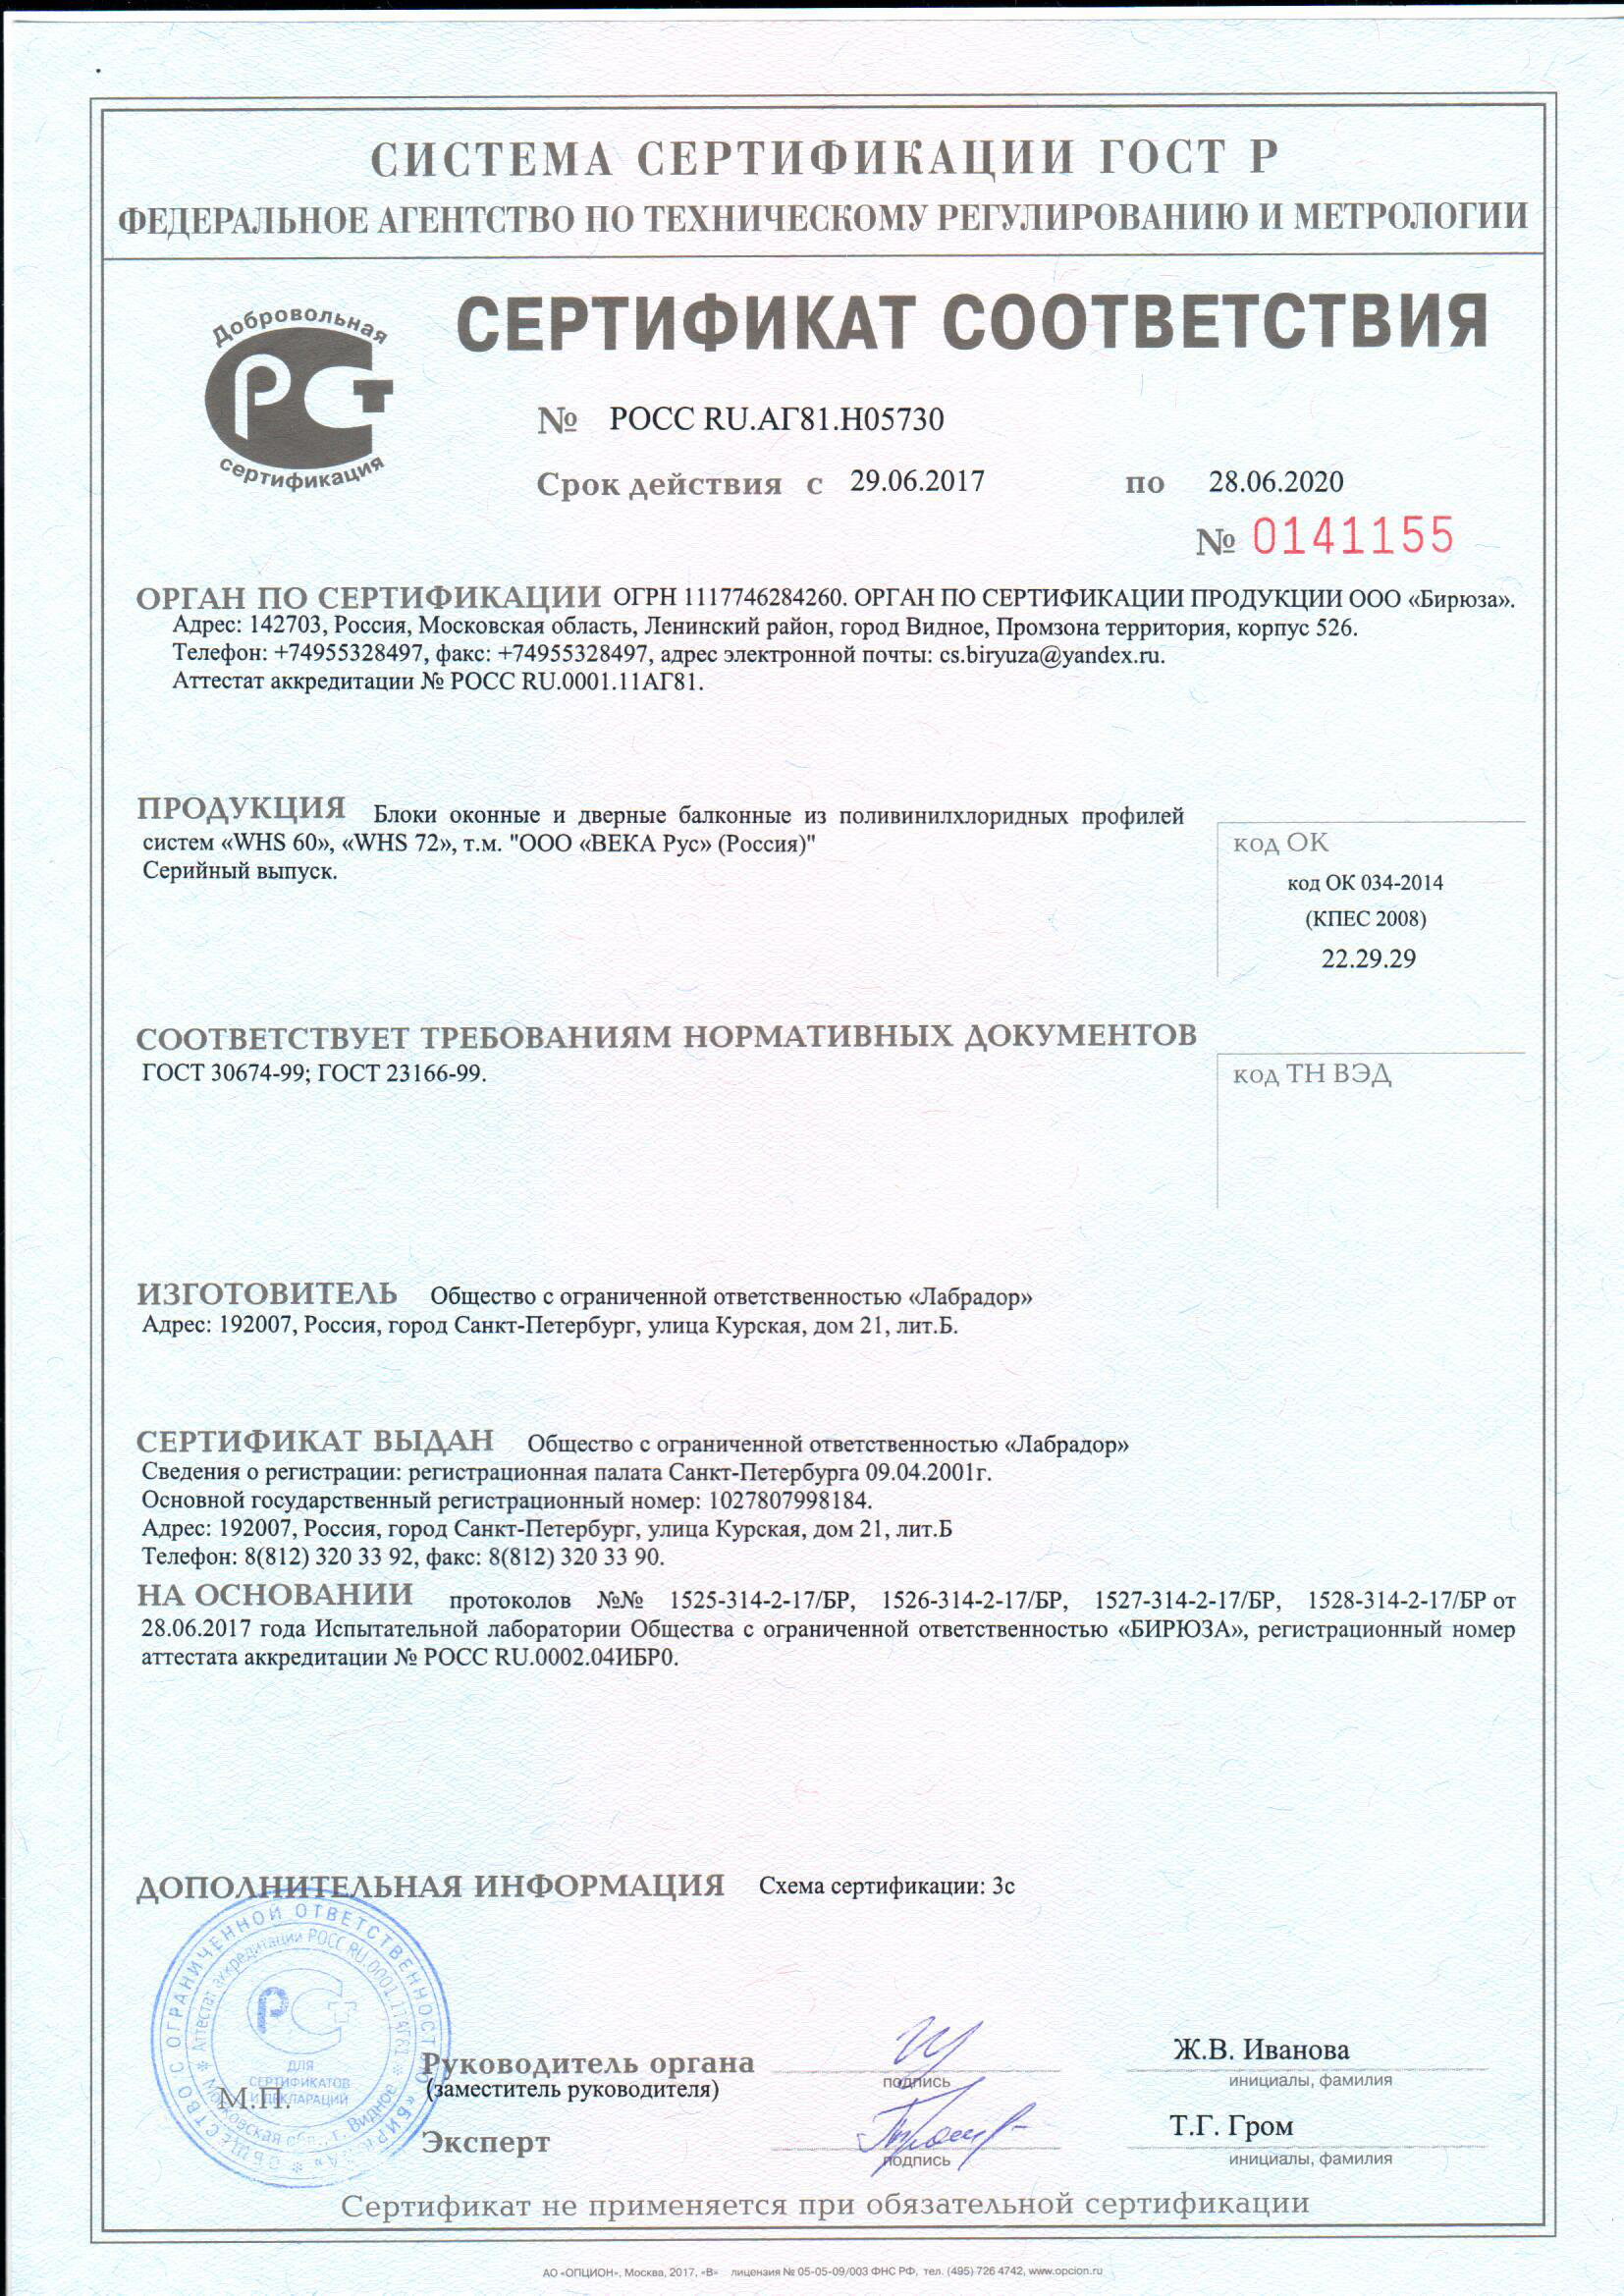 Сертификат на WHS 60 и 72